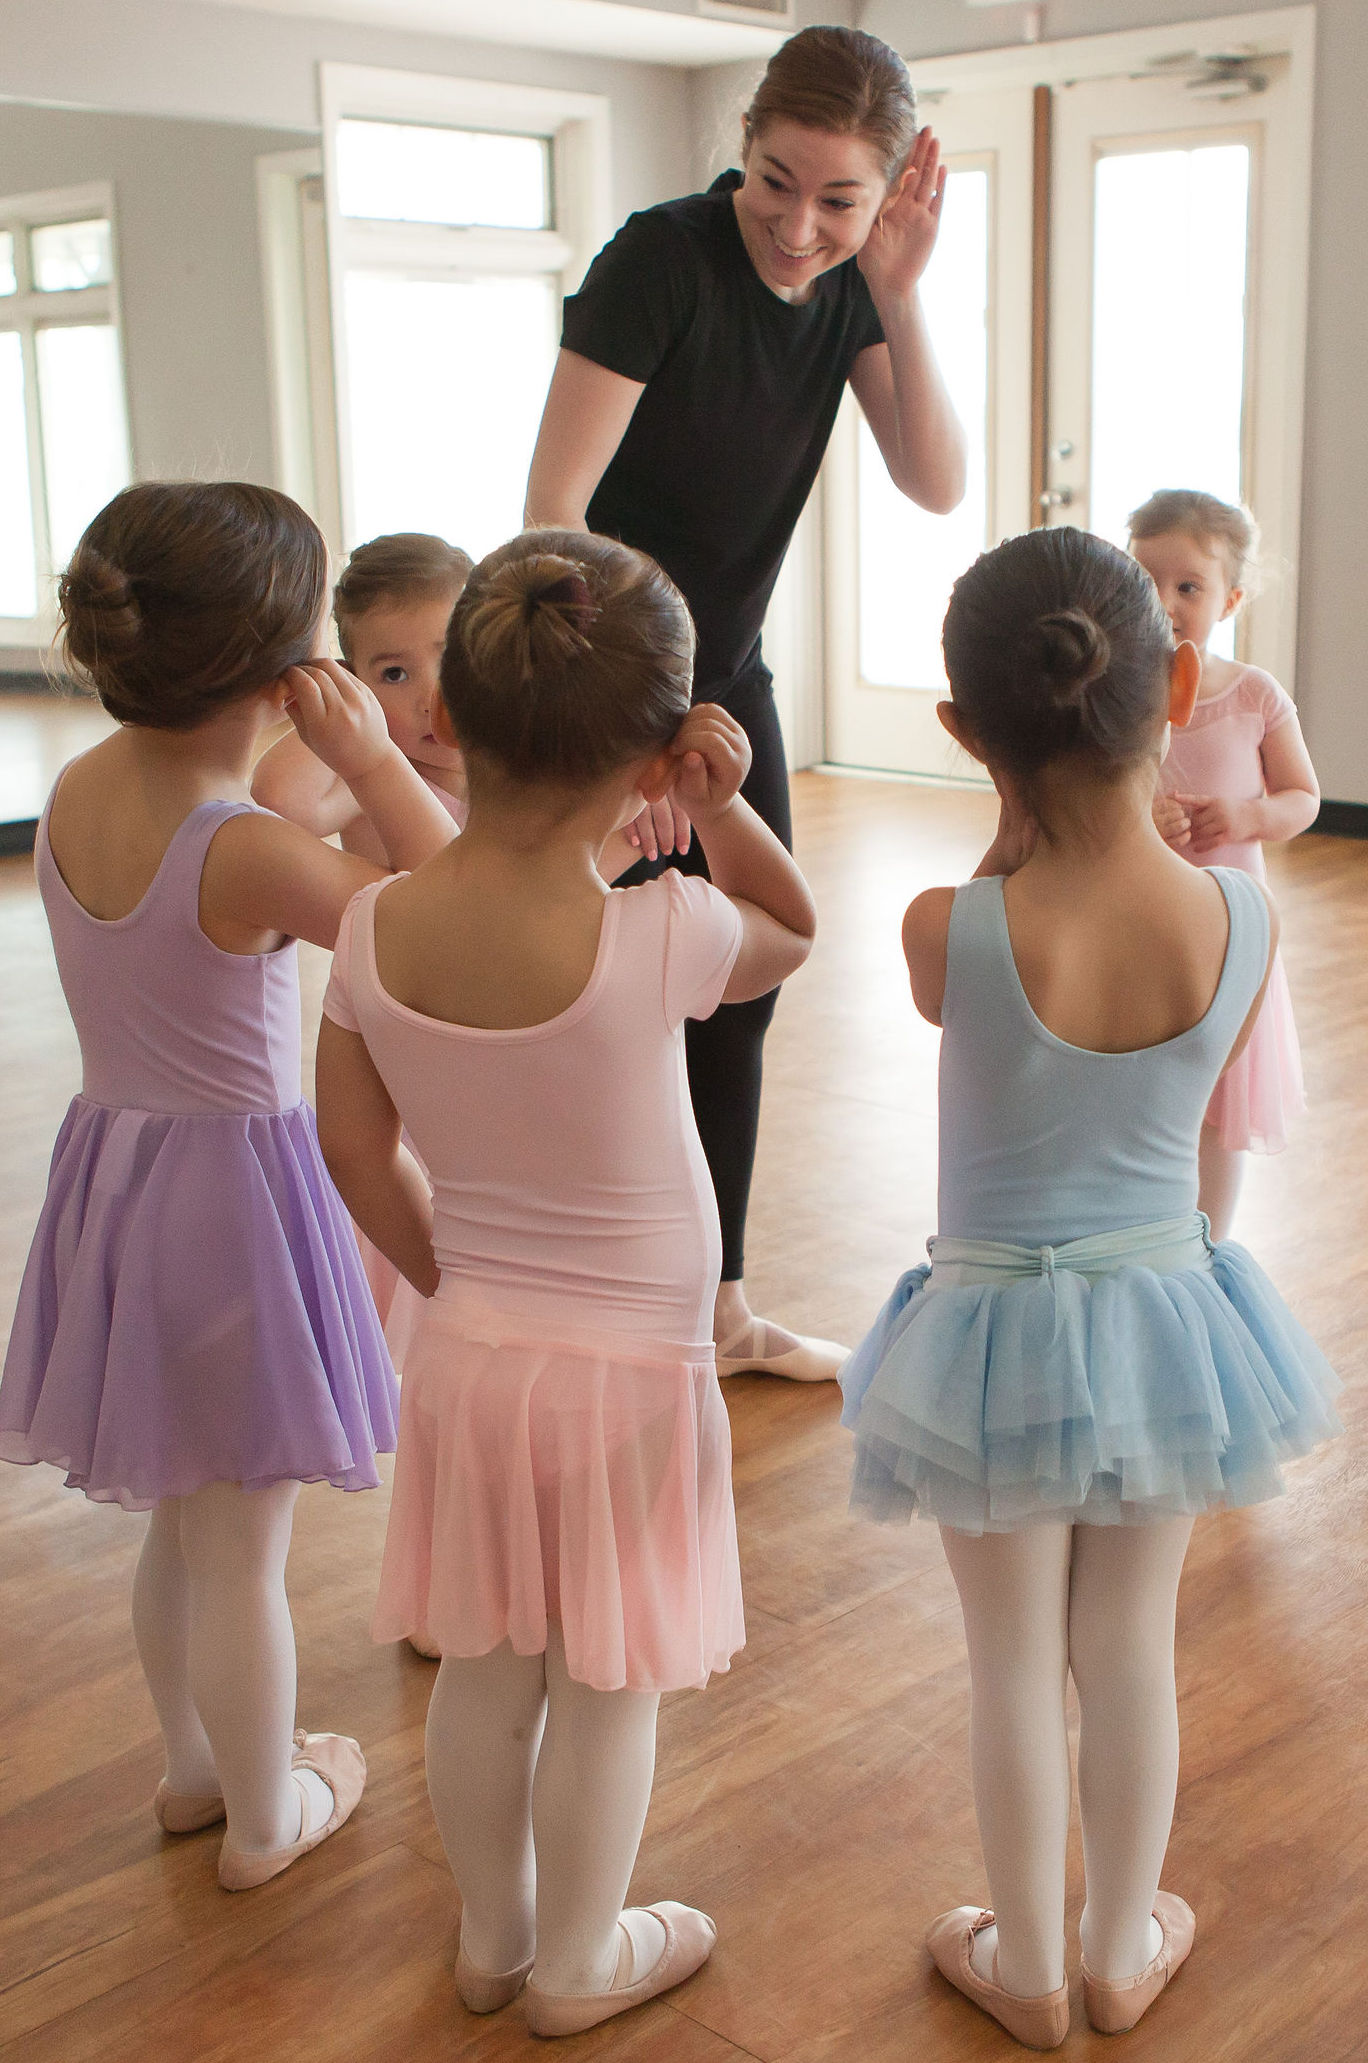 Alyssa Perron Devotion Danceworks